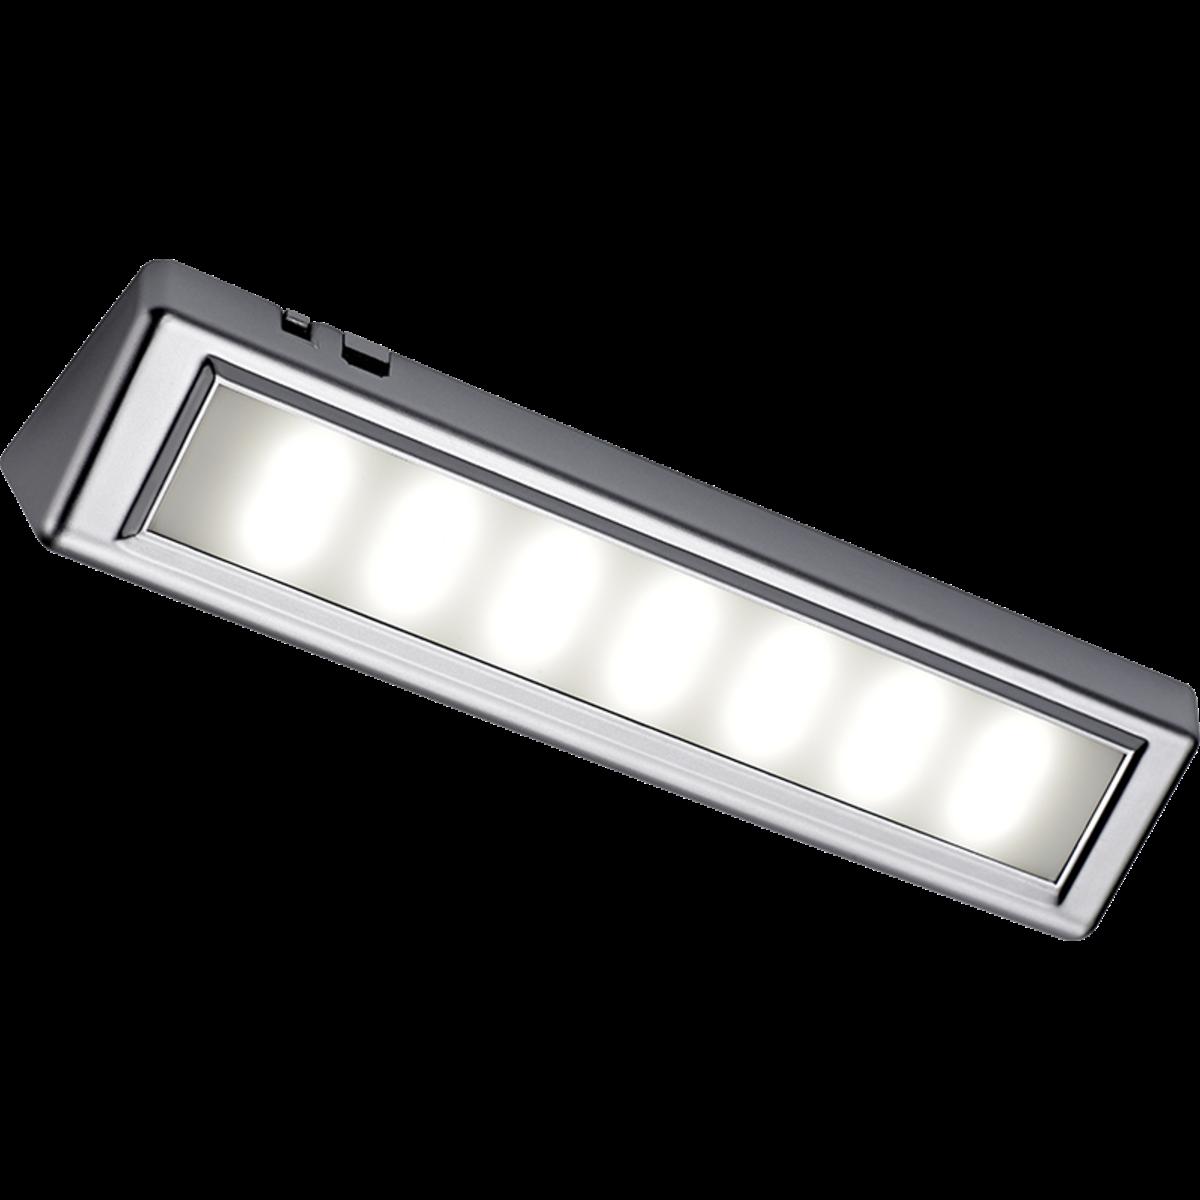 LED sensor angled light - Rechargeable